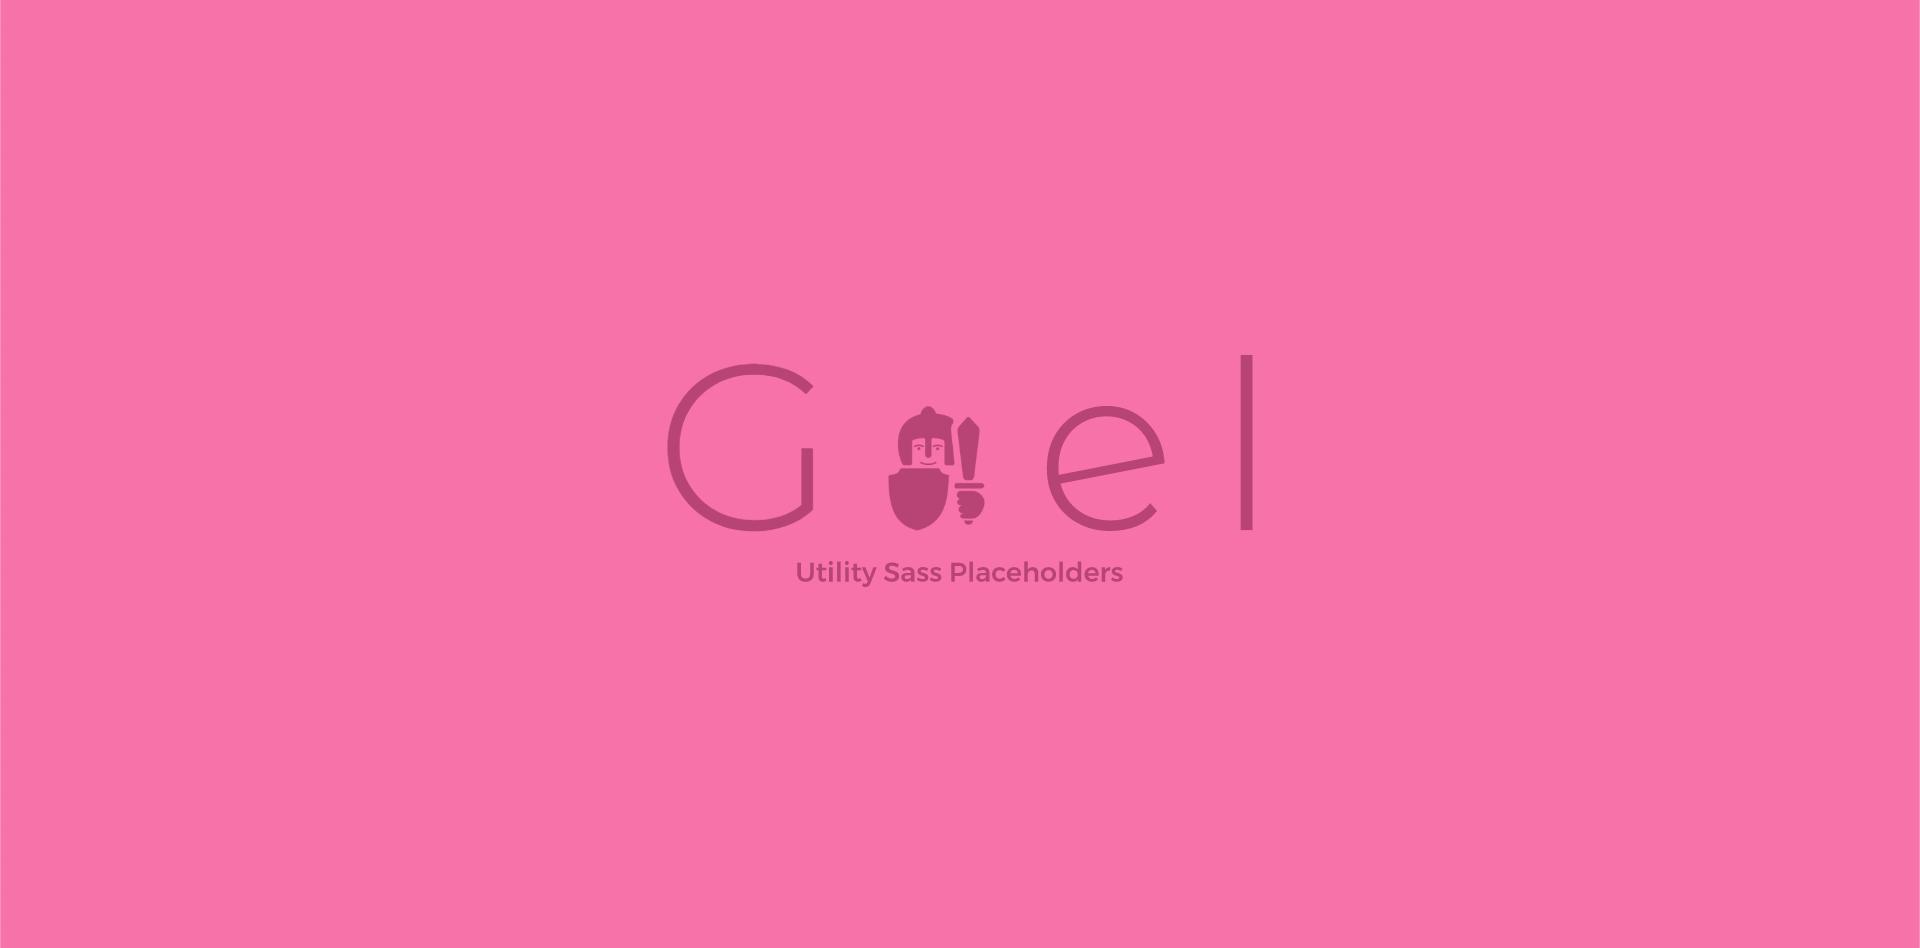 Goel logo